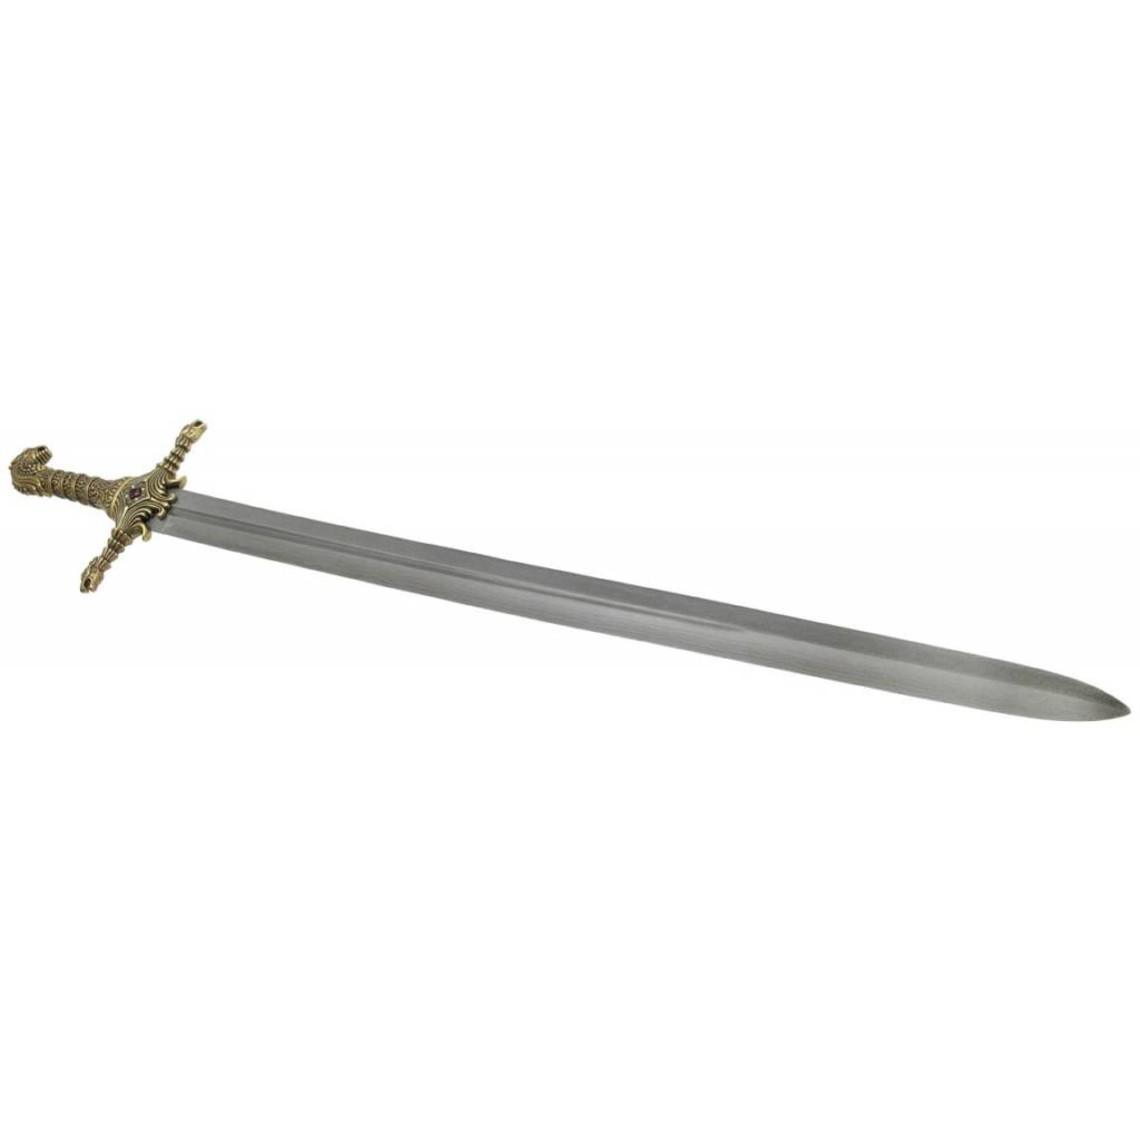 United Cutlery Game of thrones espada Oathkeeper